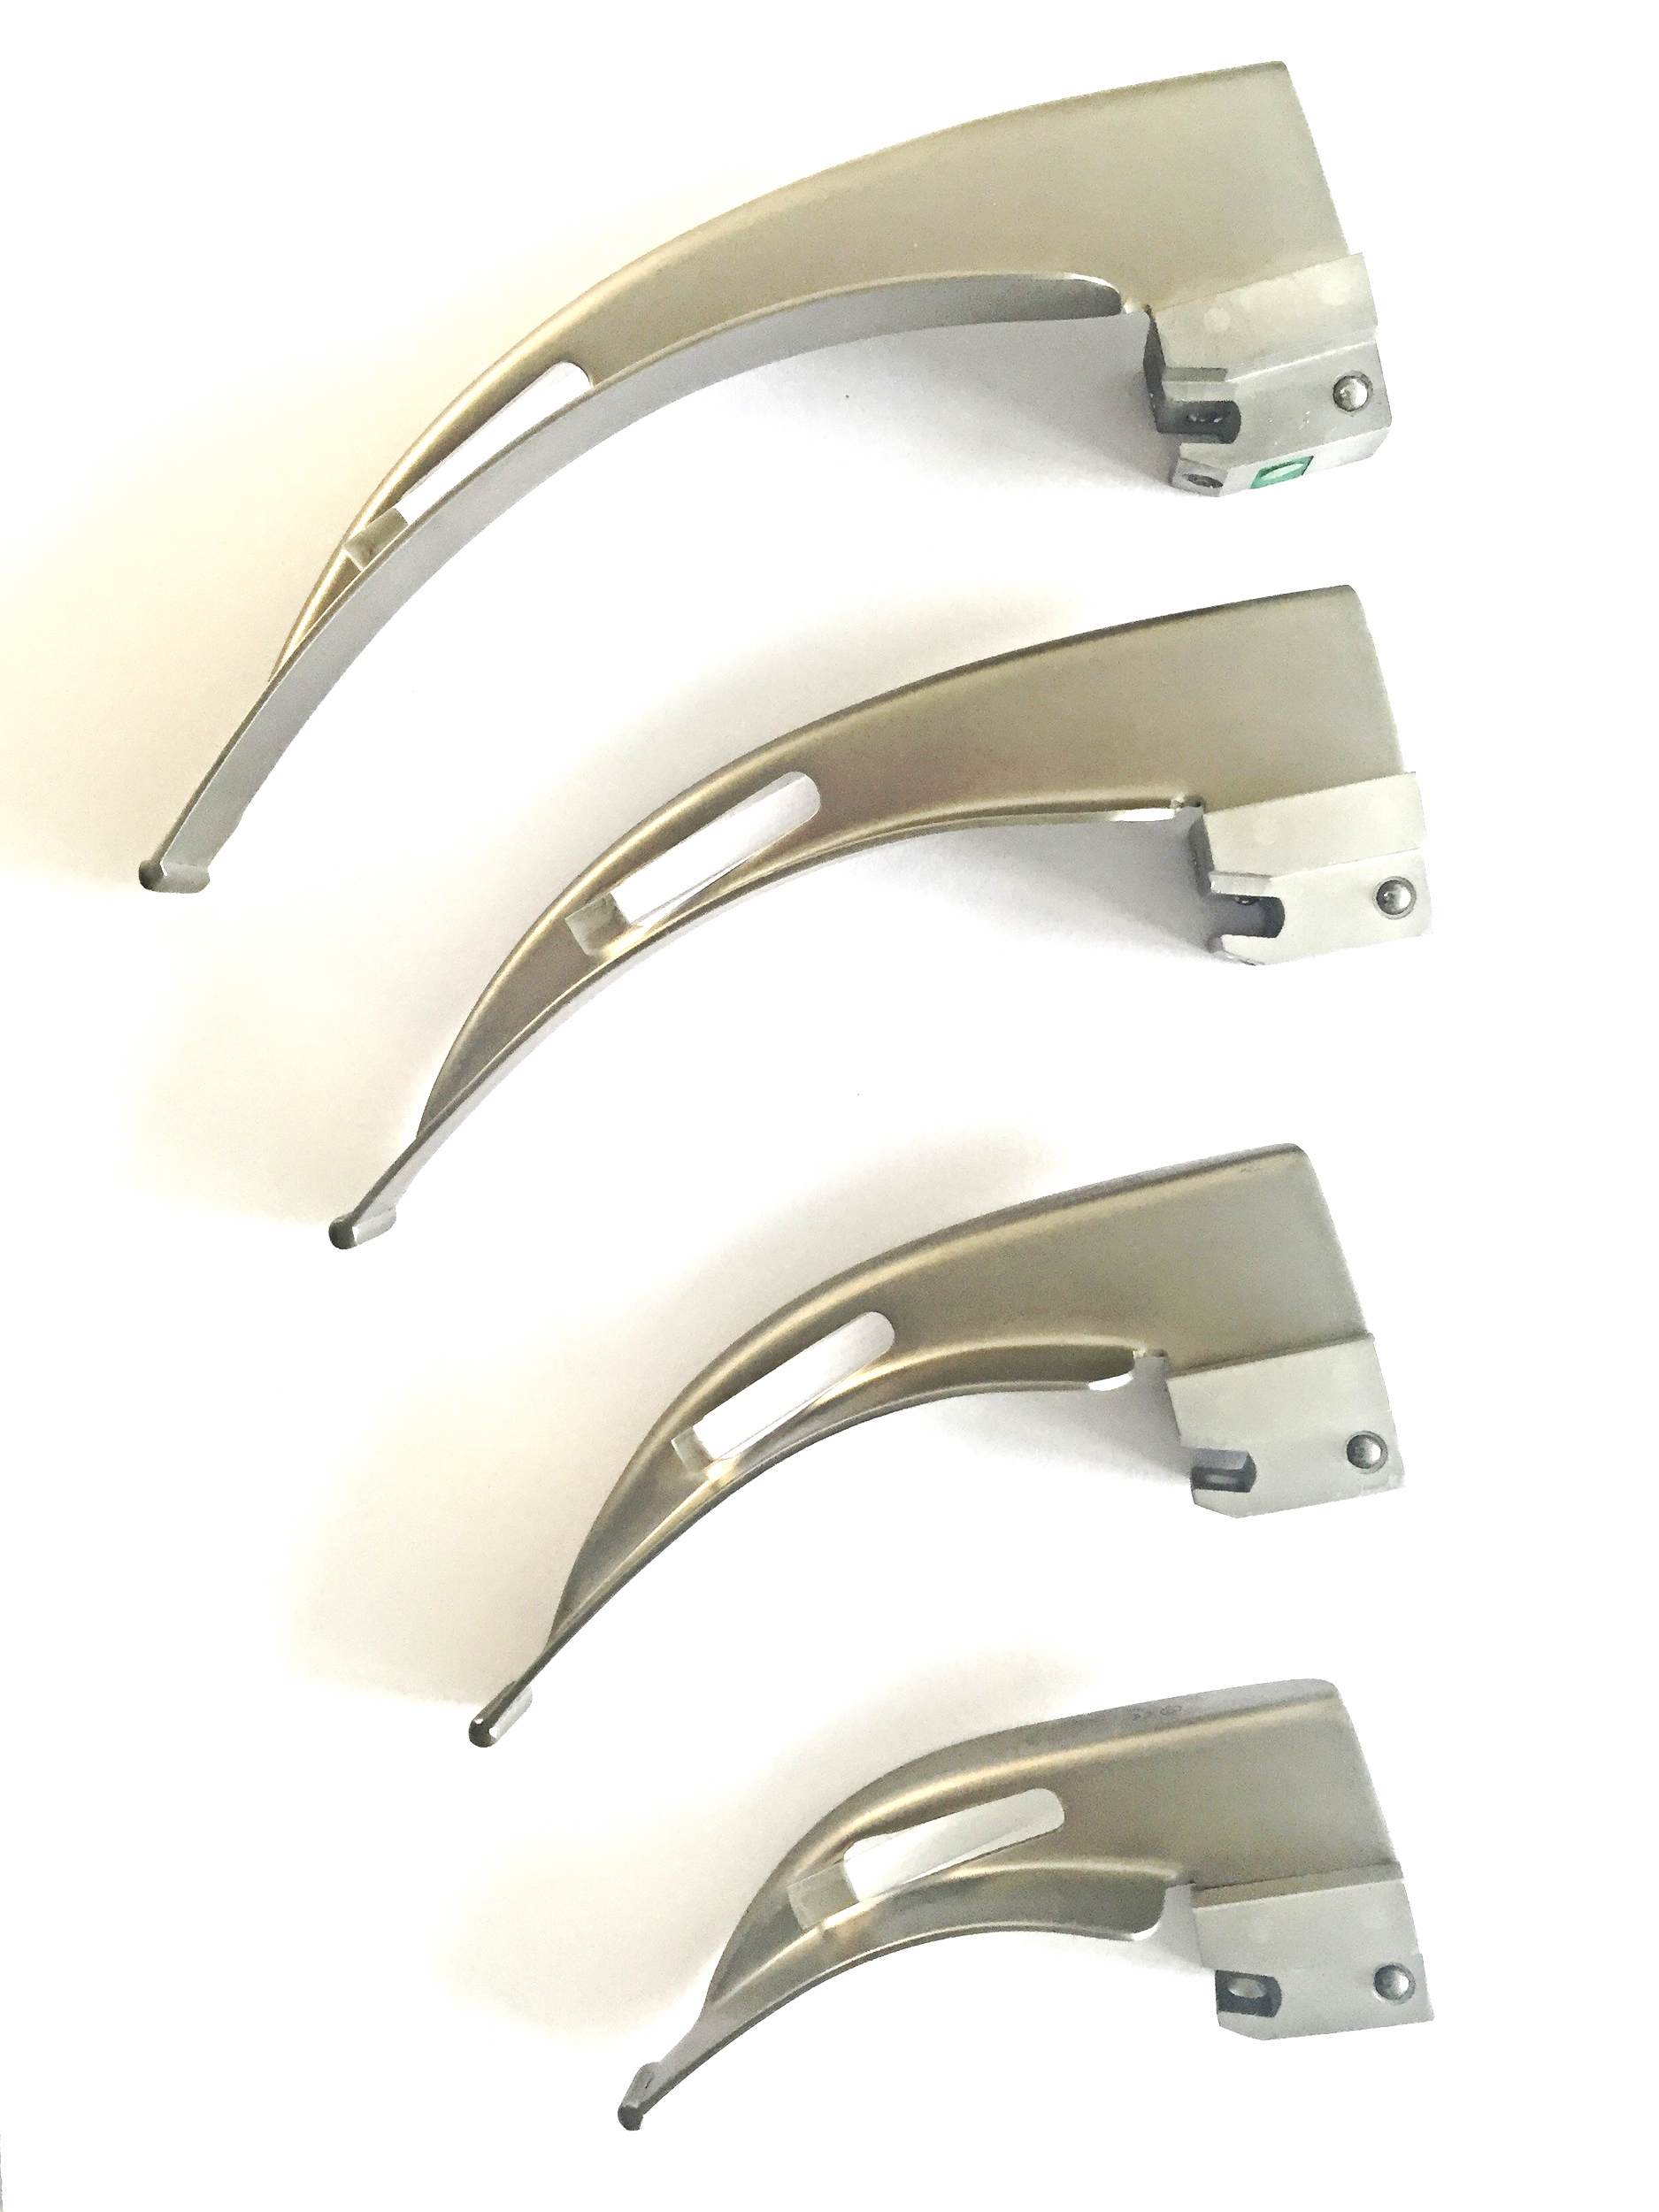 Laryngoscoop bladen MacIntosh size 00, 0, 1, 2, 3 en 4